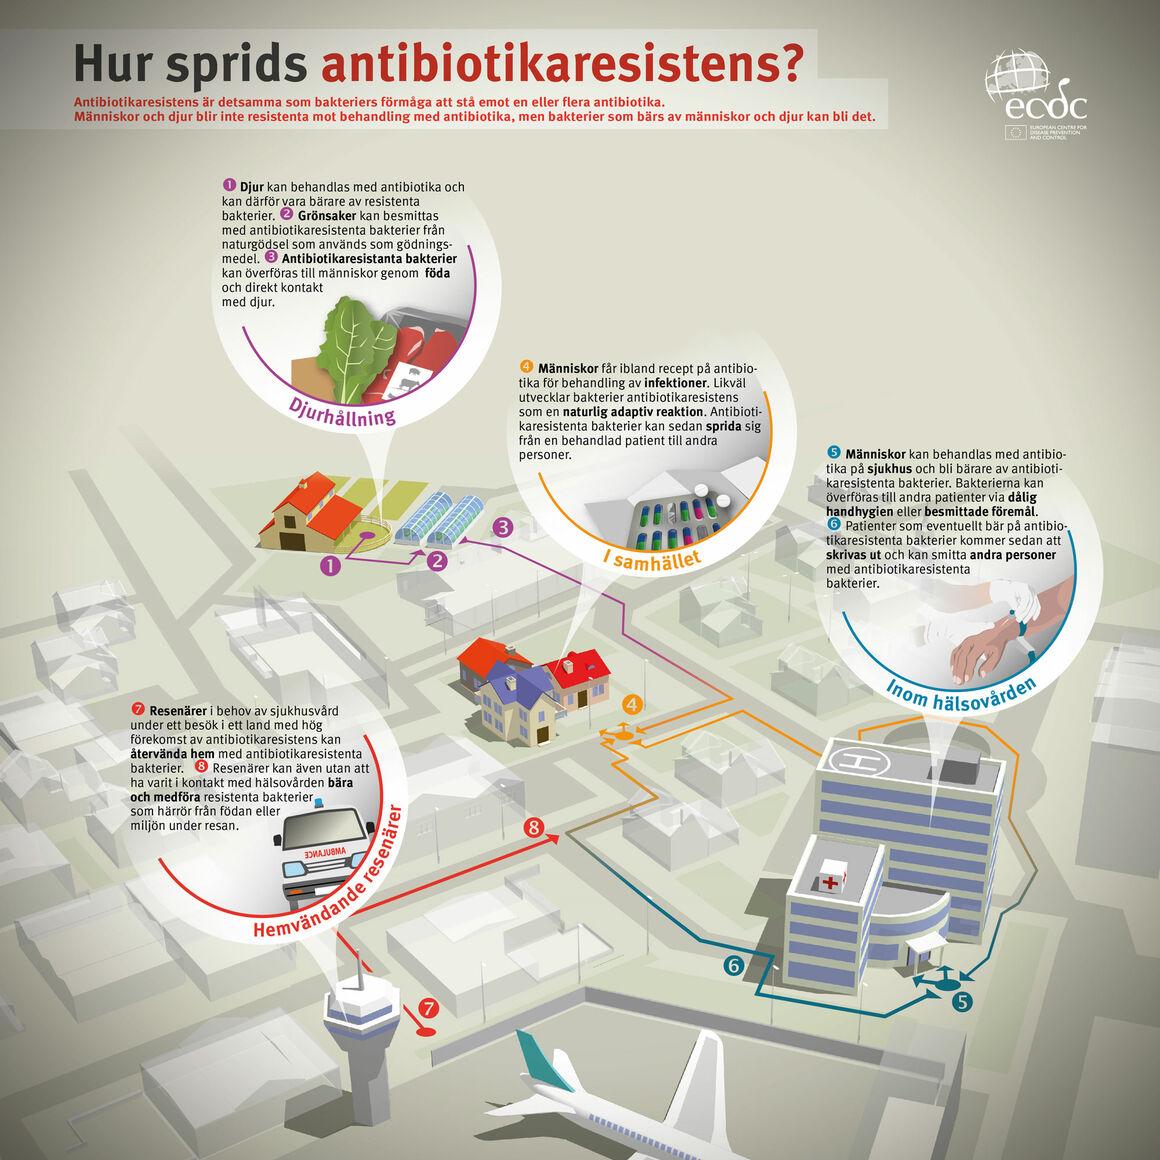 Hur sprids antibiotikaresistens?